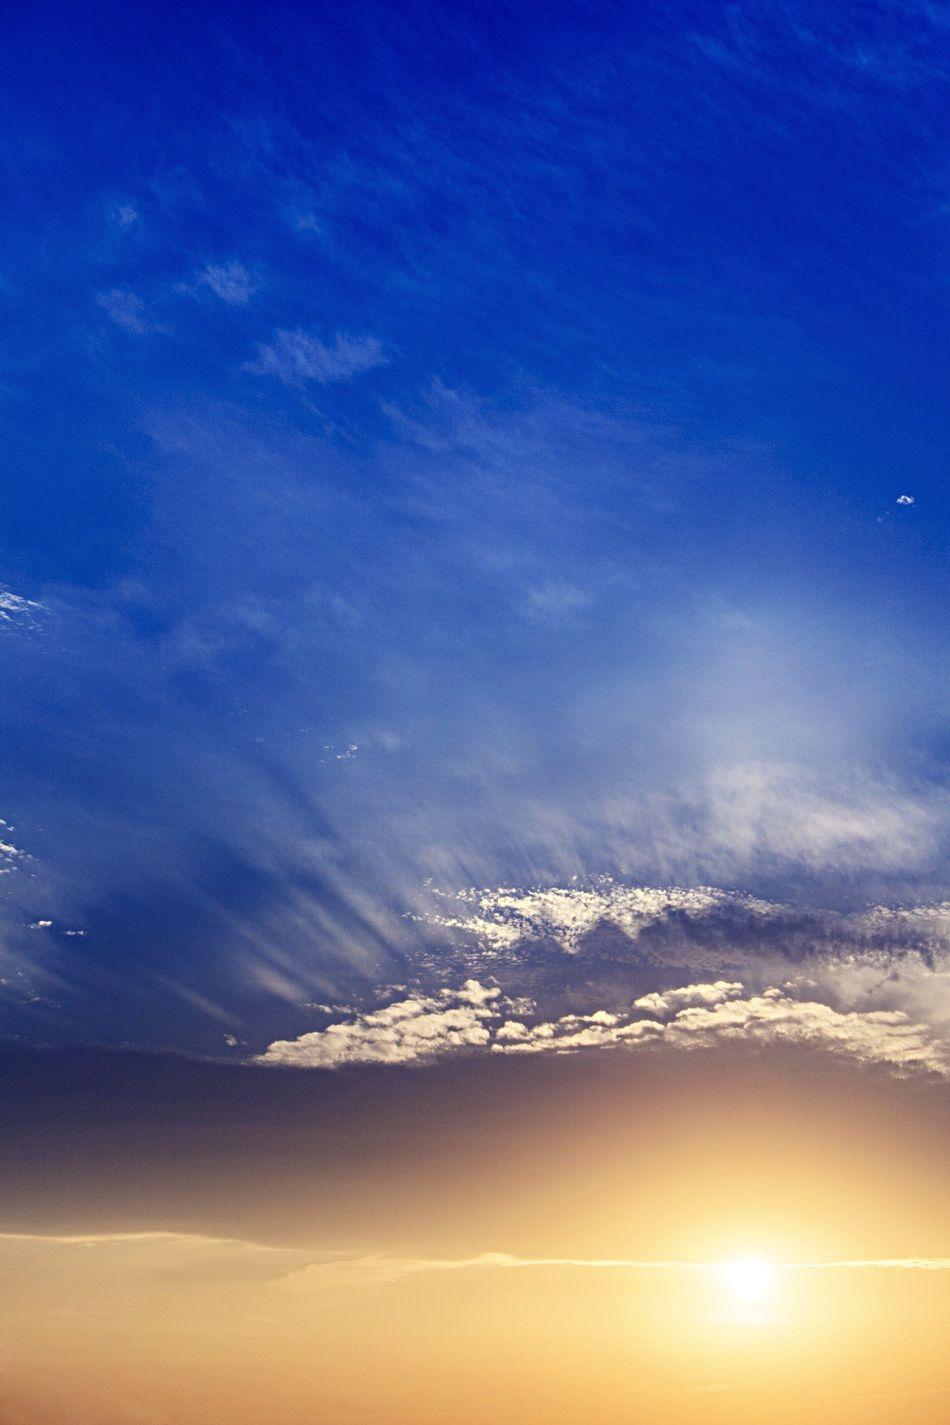 Evening Setting Sun